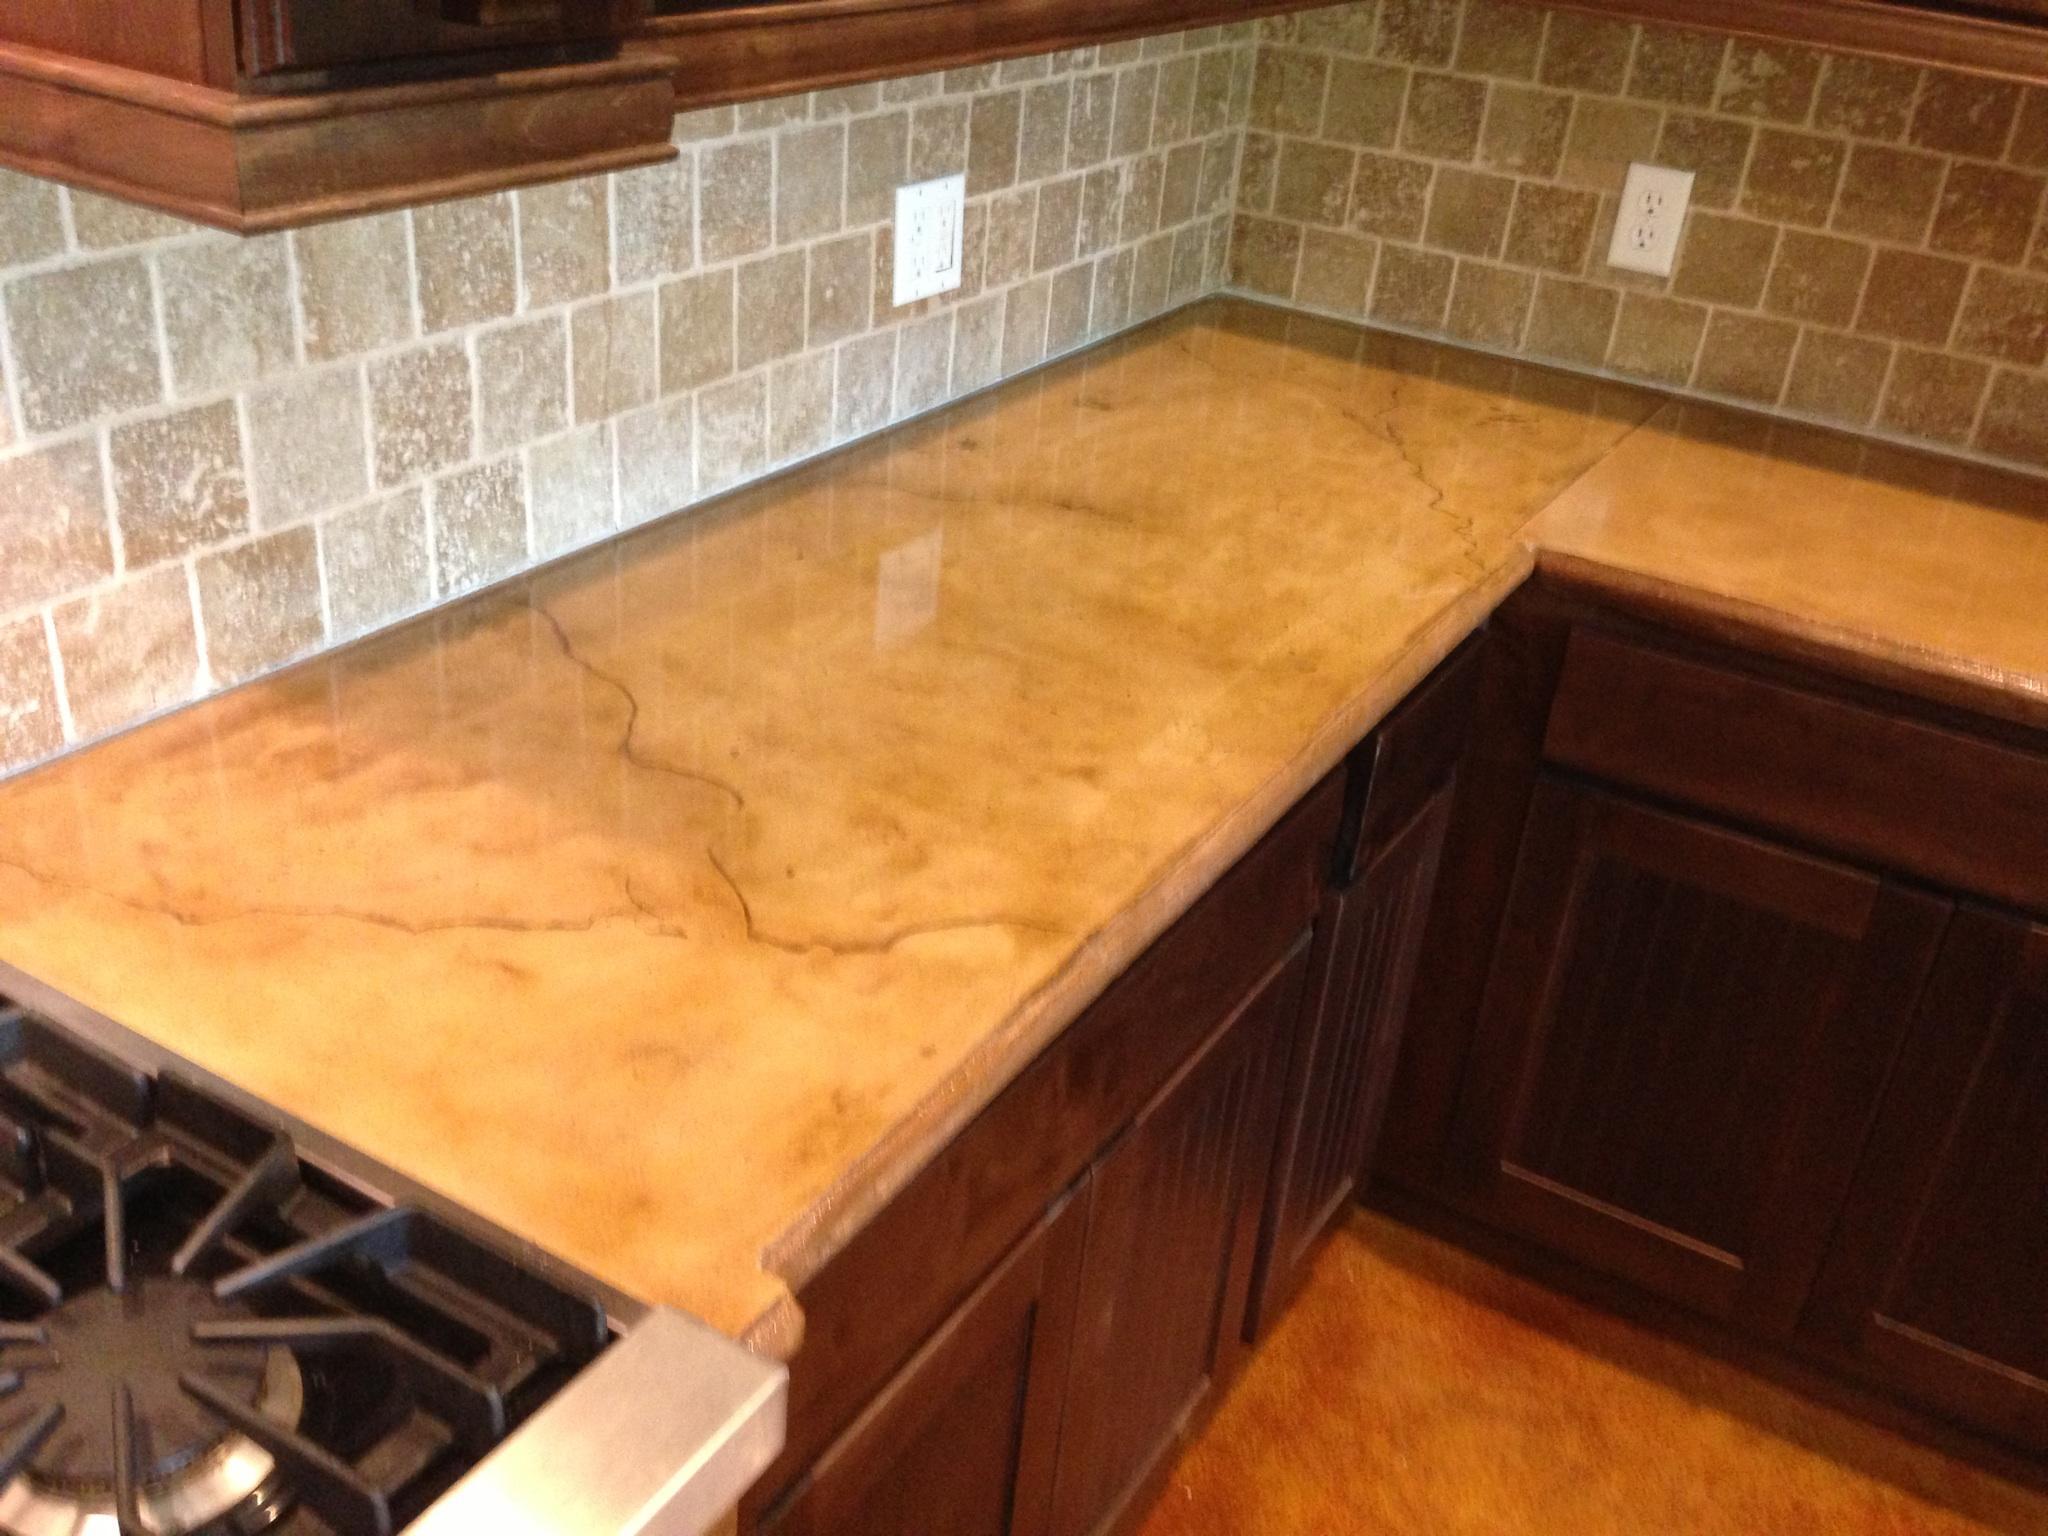 concrete installer discovers concrete countertops concrete kitchen countertops Veined Beige Travertine Concrete Countertop